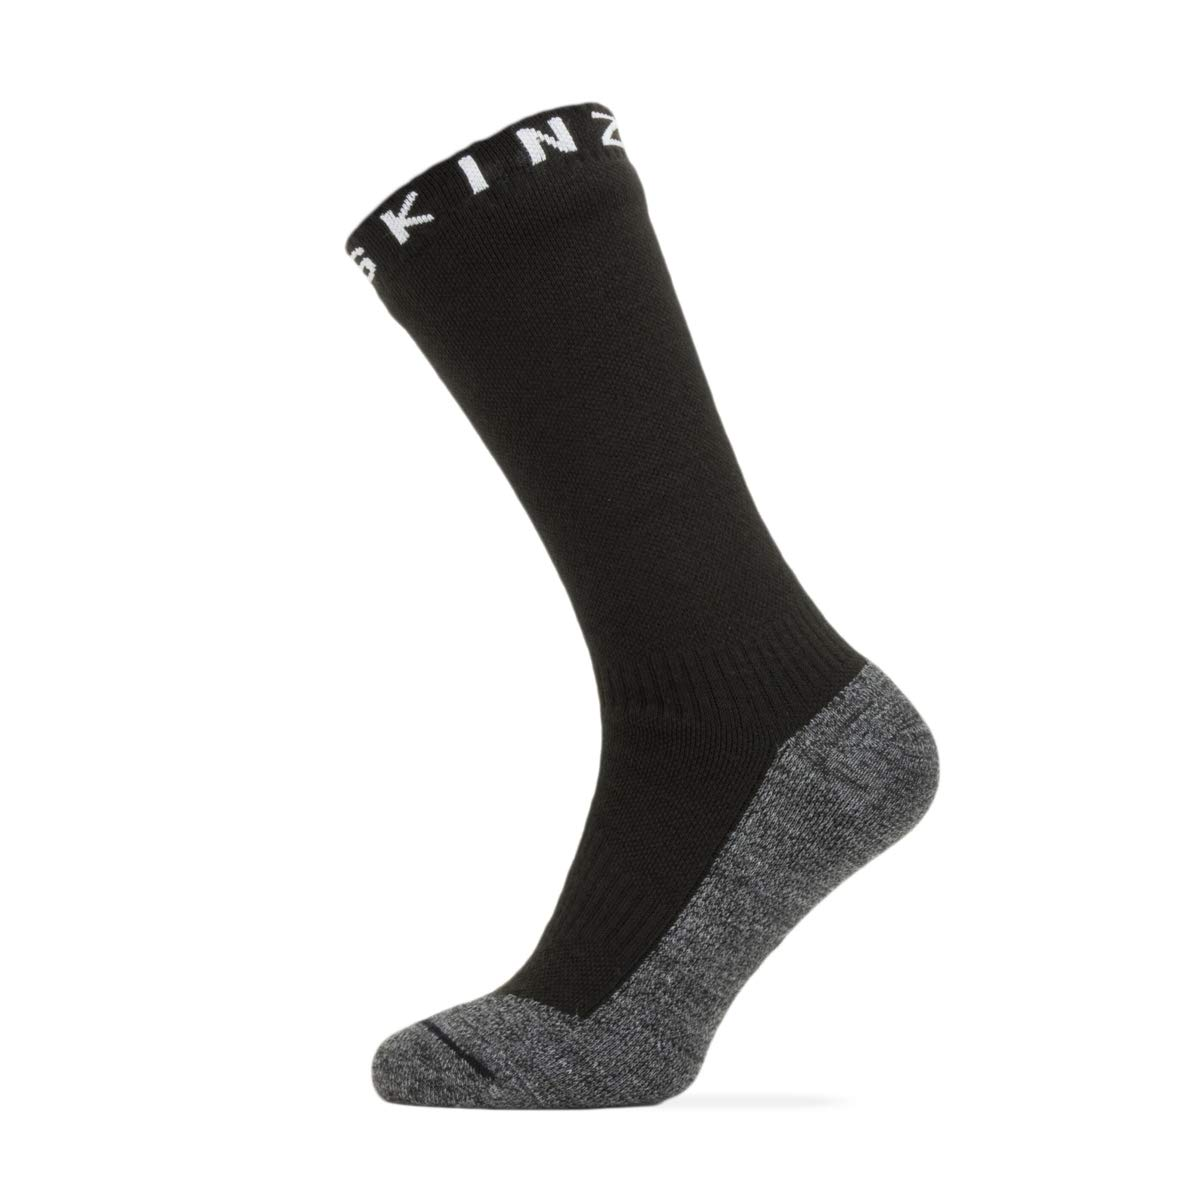 SealSkinz Waterproof Warm Weather Soft Touch Mid Length Sock